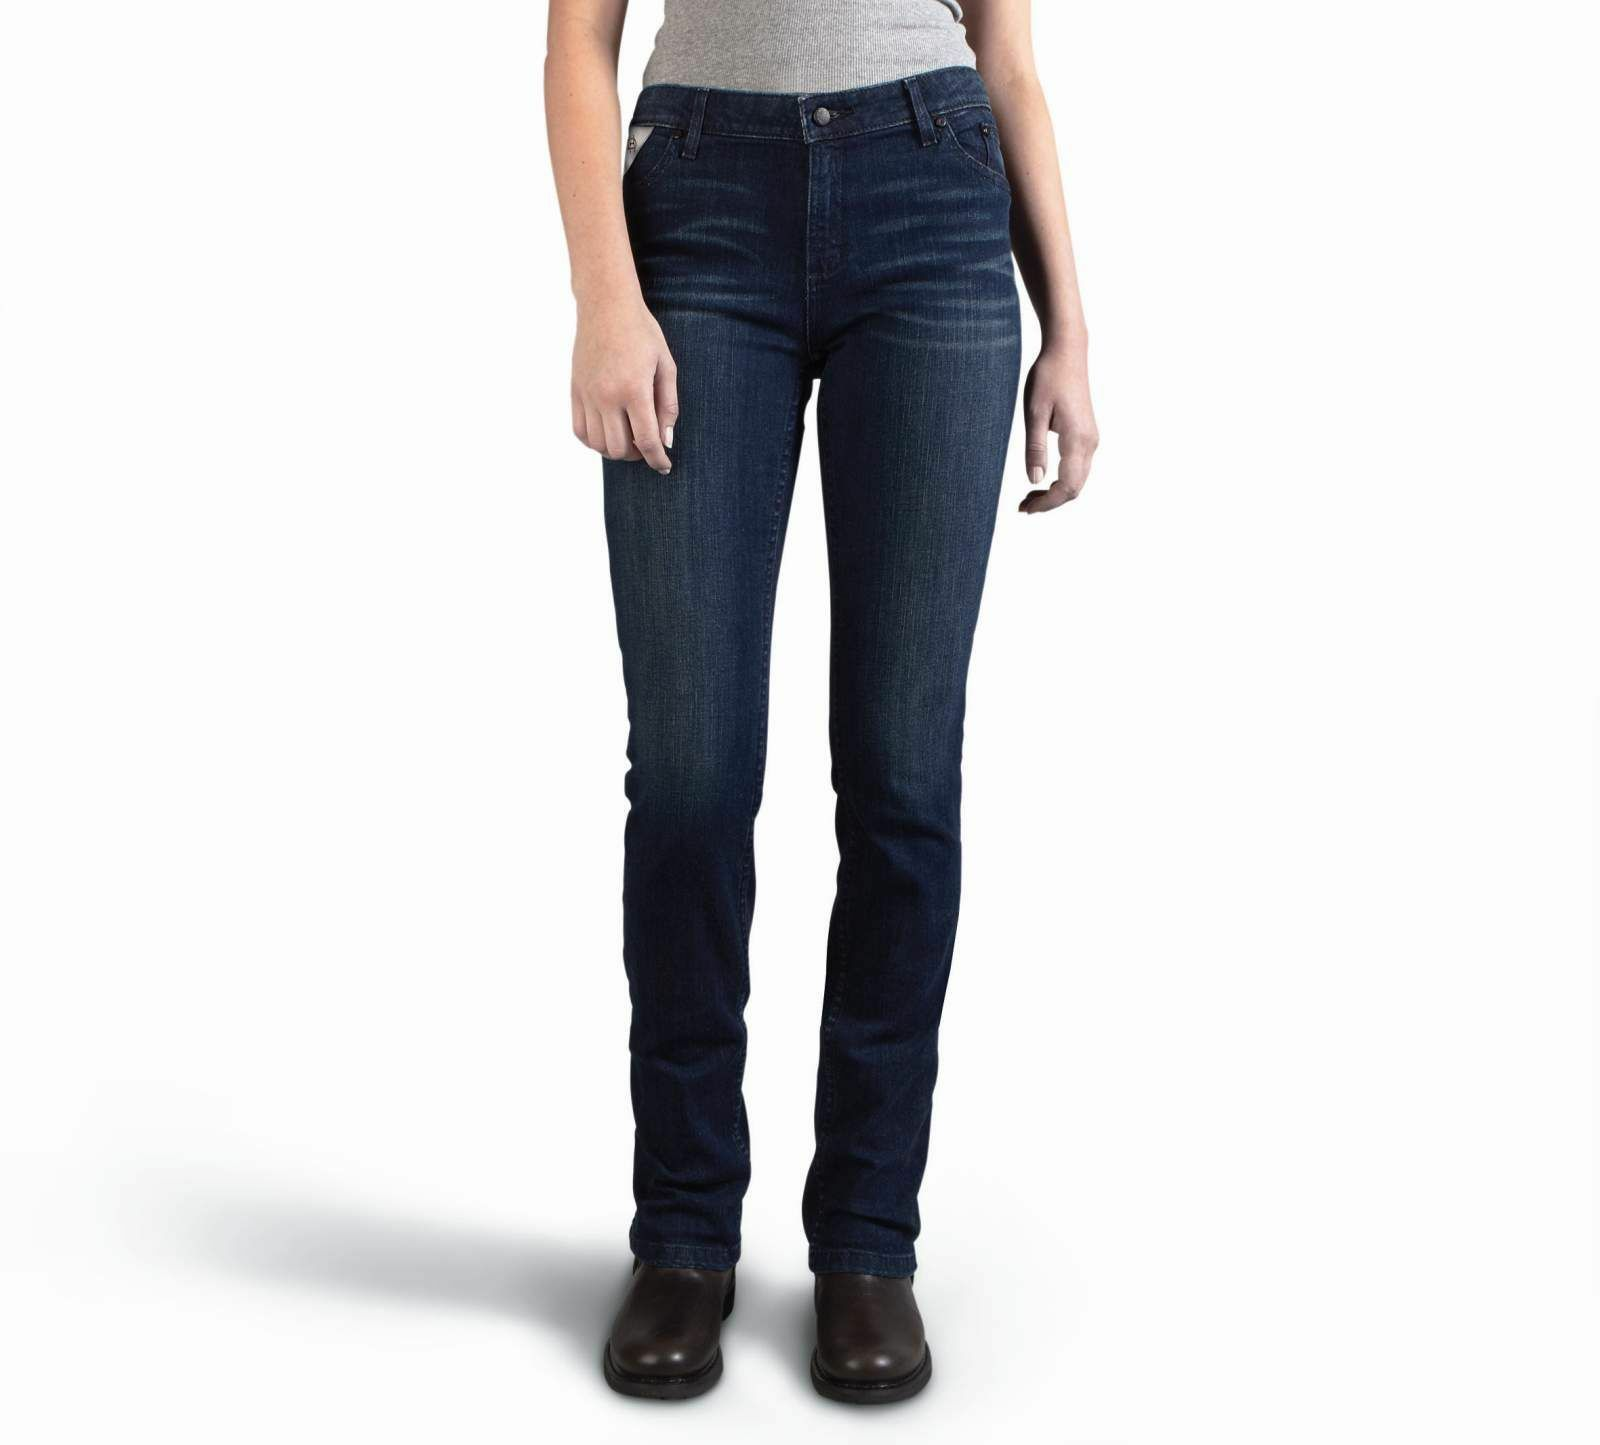 Harley Davidson Women's Slim Boot Cut Mid-Rise Jeans 99179-16VW SIZE 26